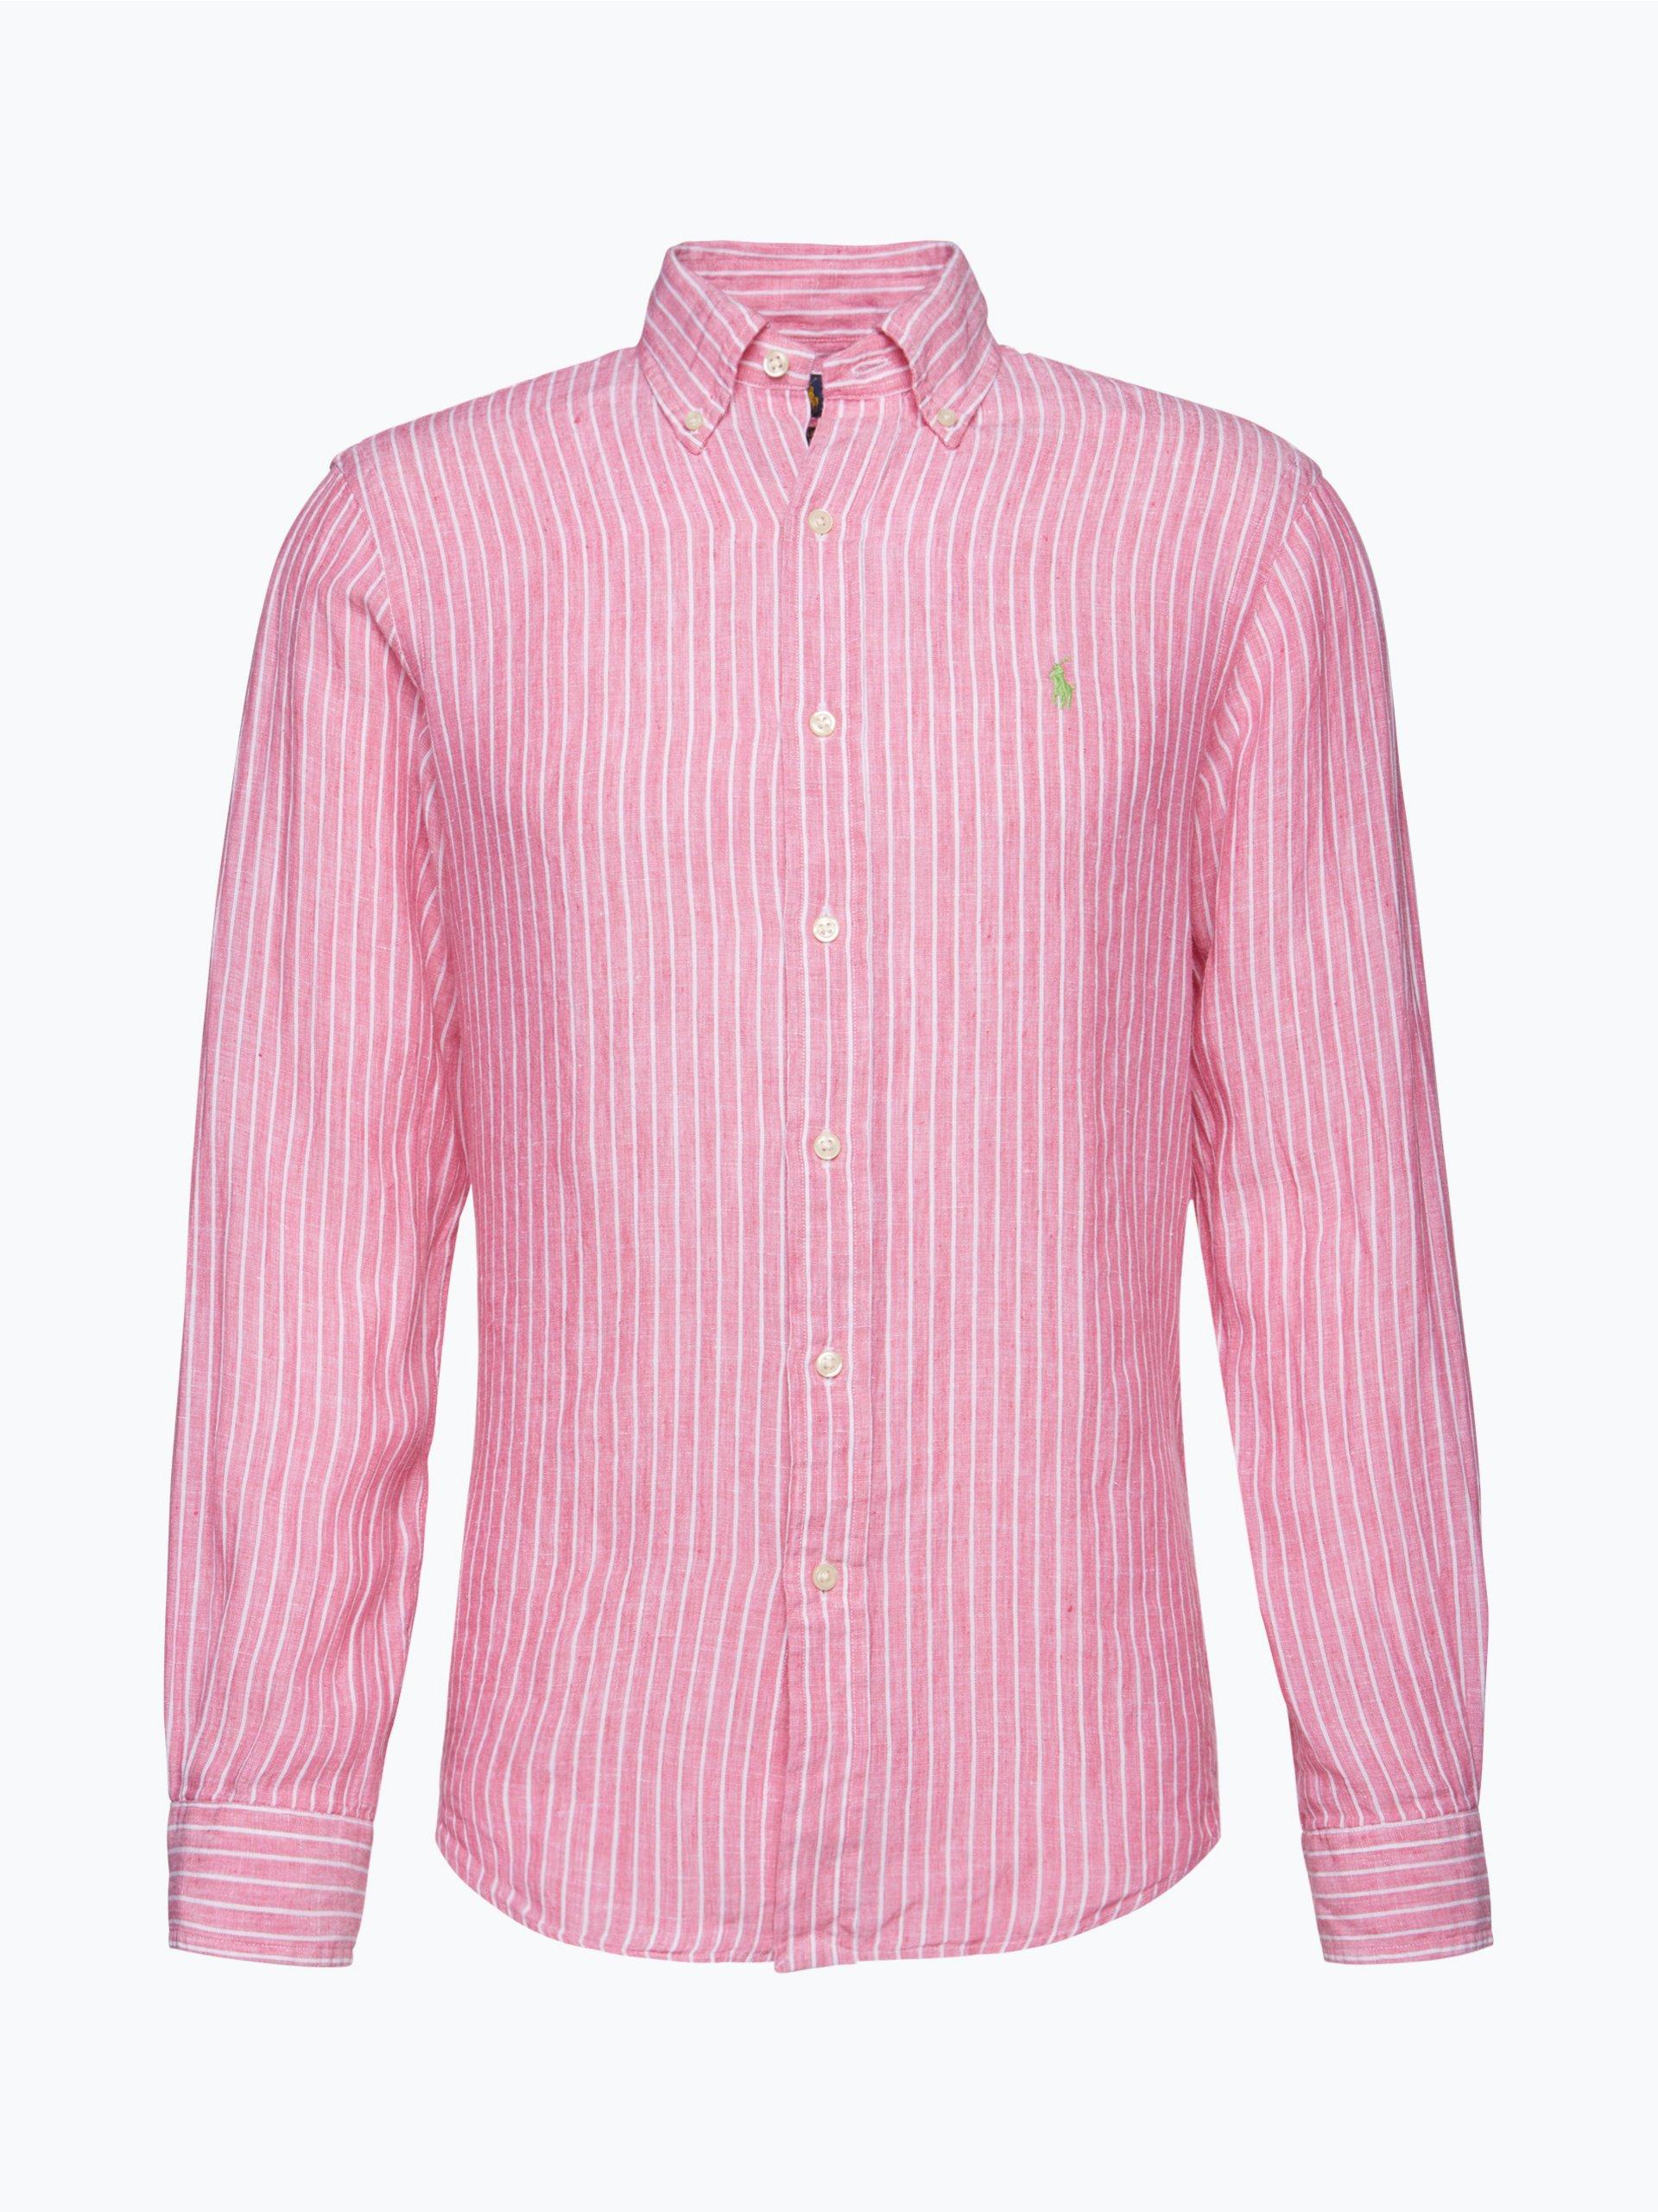 polo ralph lauren herren hemd aus leinen pink gestreift. Black Bedroom Furniture Sets. Home Design Ideas